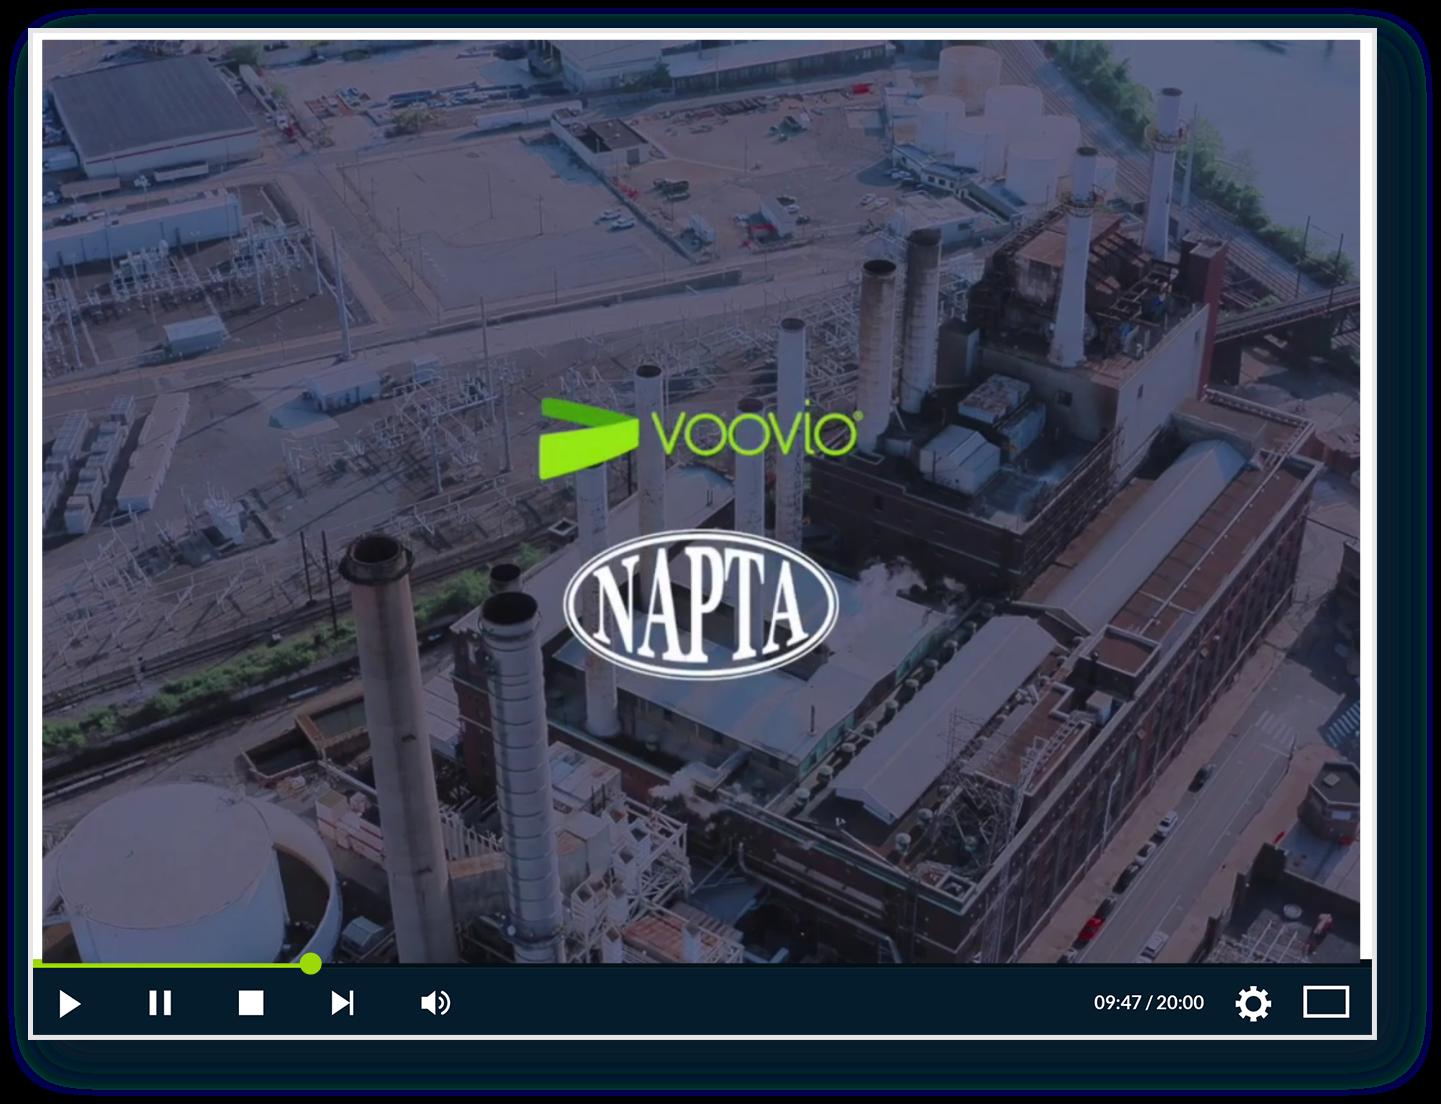 Voovio at the NAPTA Instructor Skills Conference